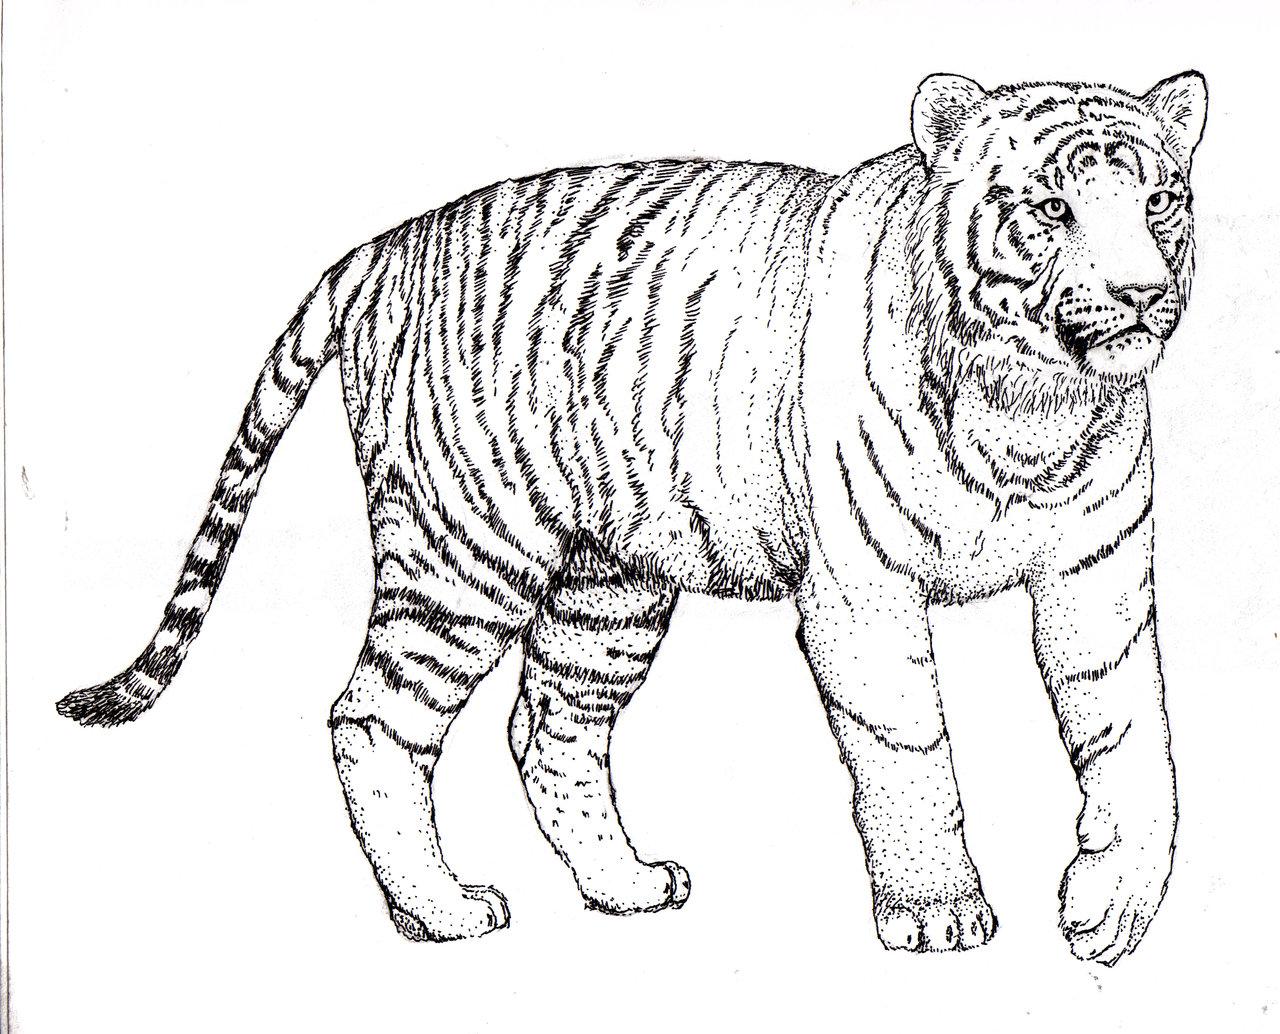 1280x1034 Tiger, Tiger, Burning Bright By Rebeccannoying On DeviantArt